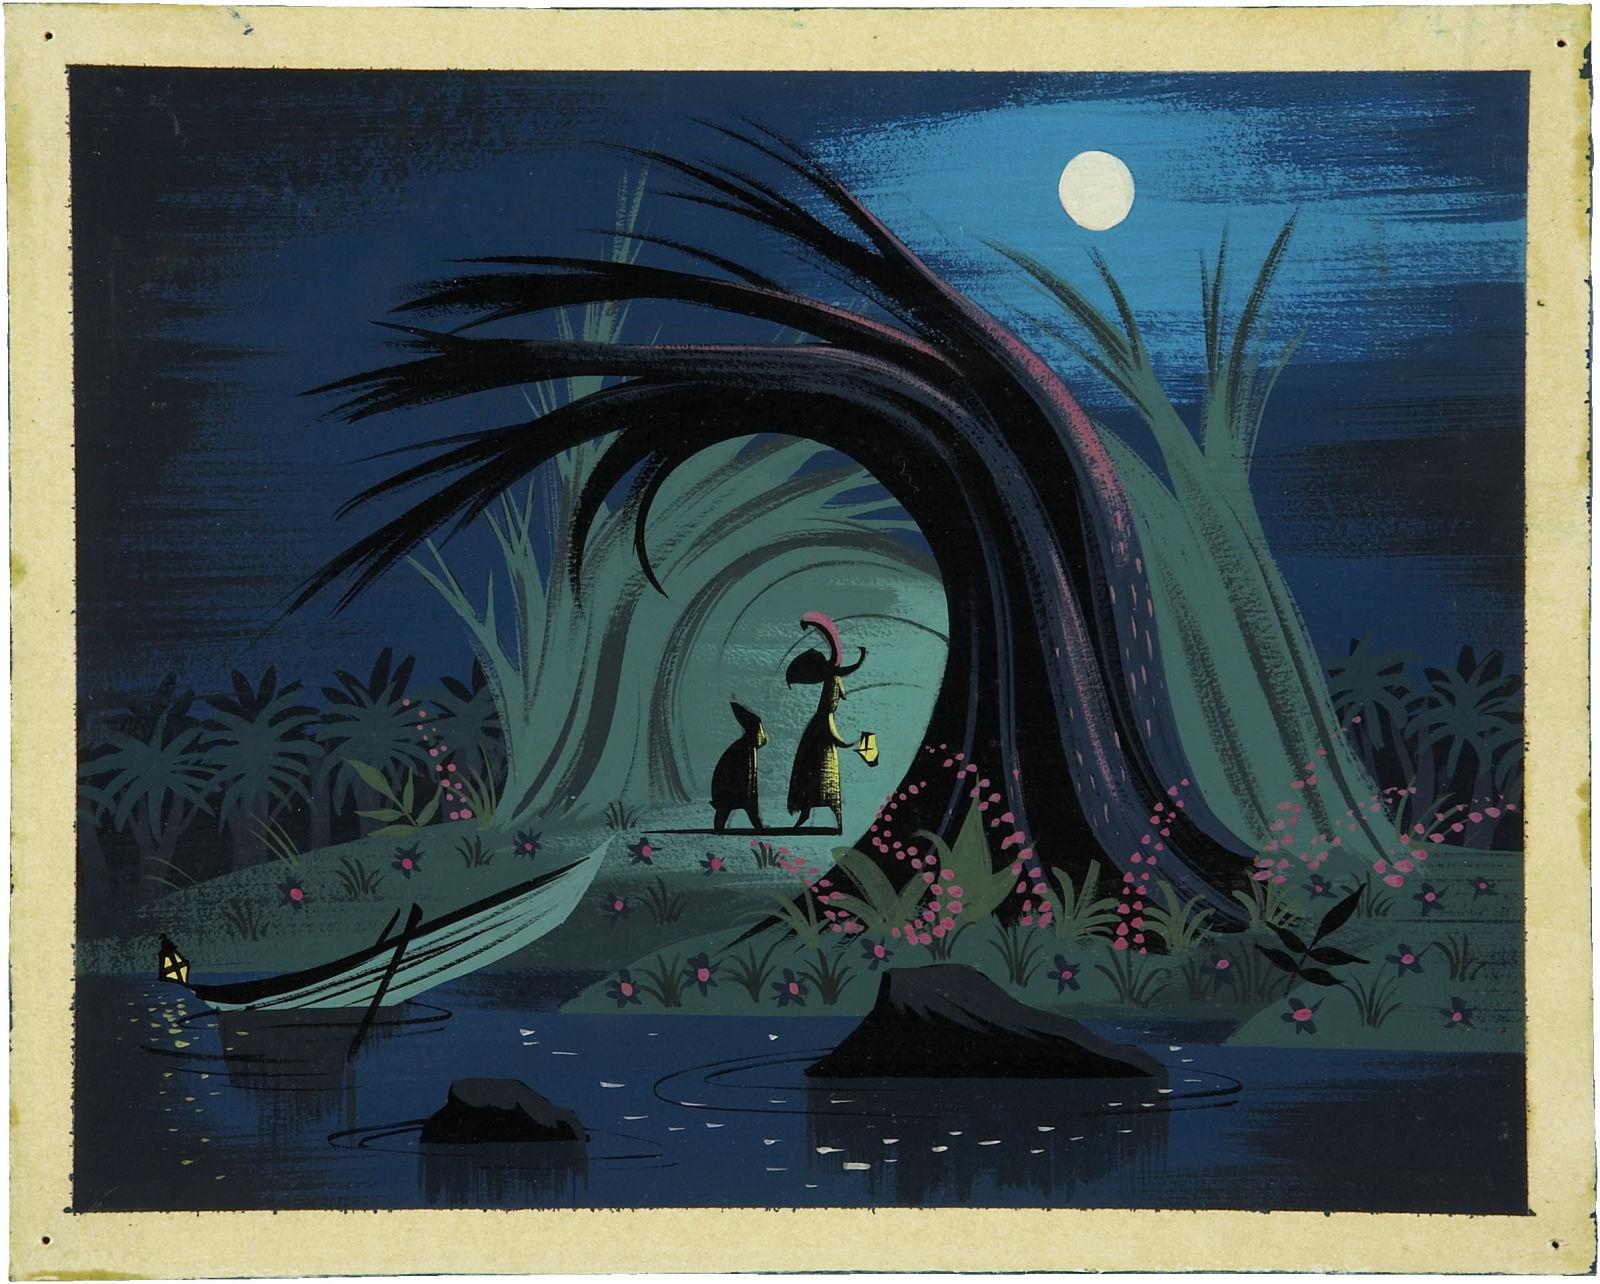 Art Disney: Children's Atheneum: Illustrator Of The Week